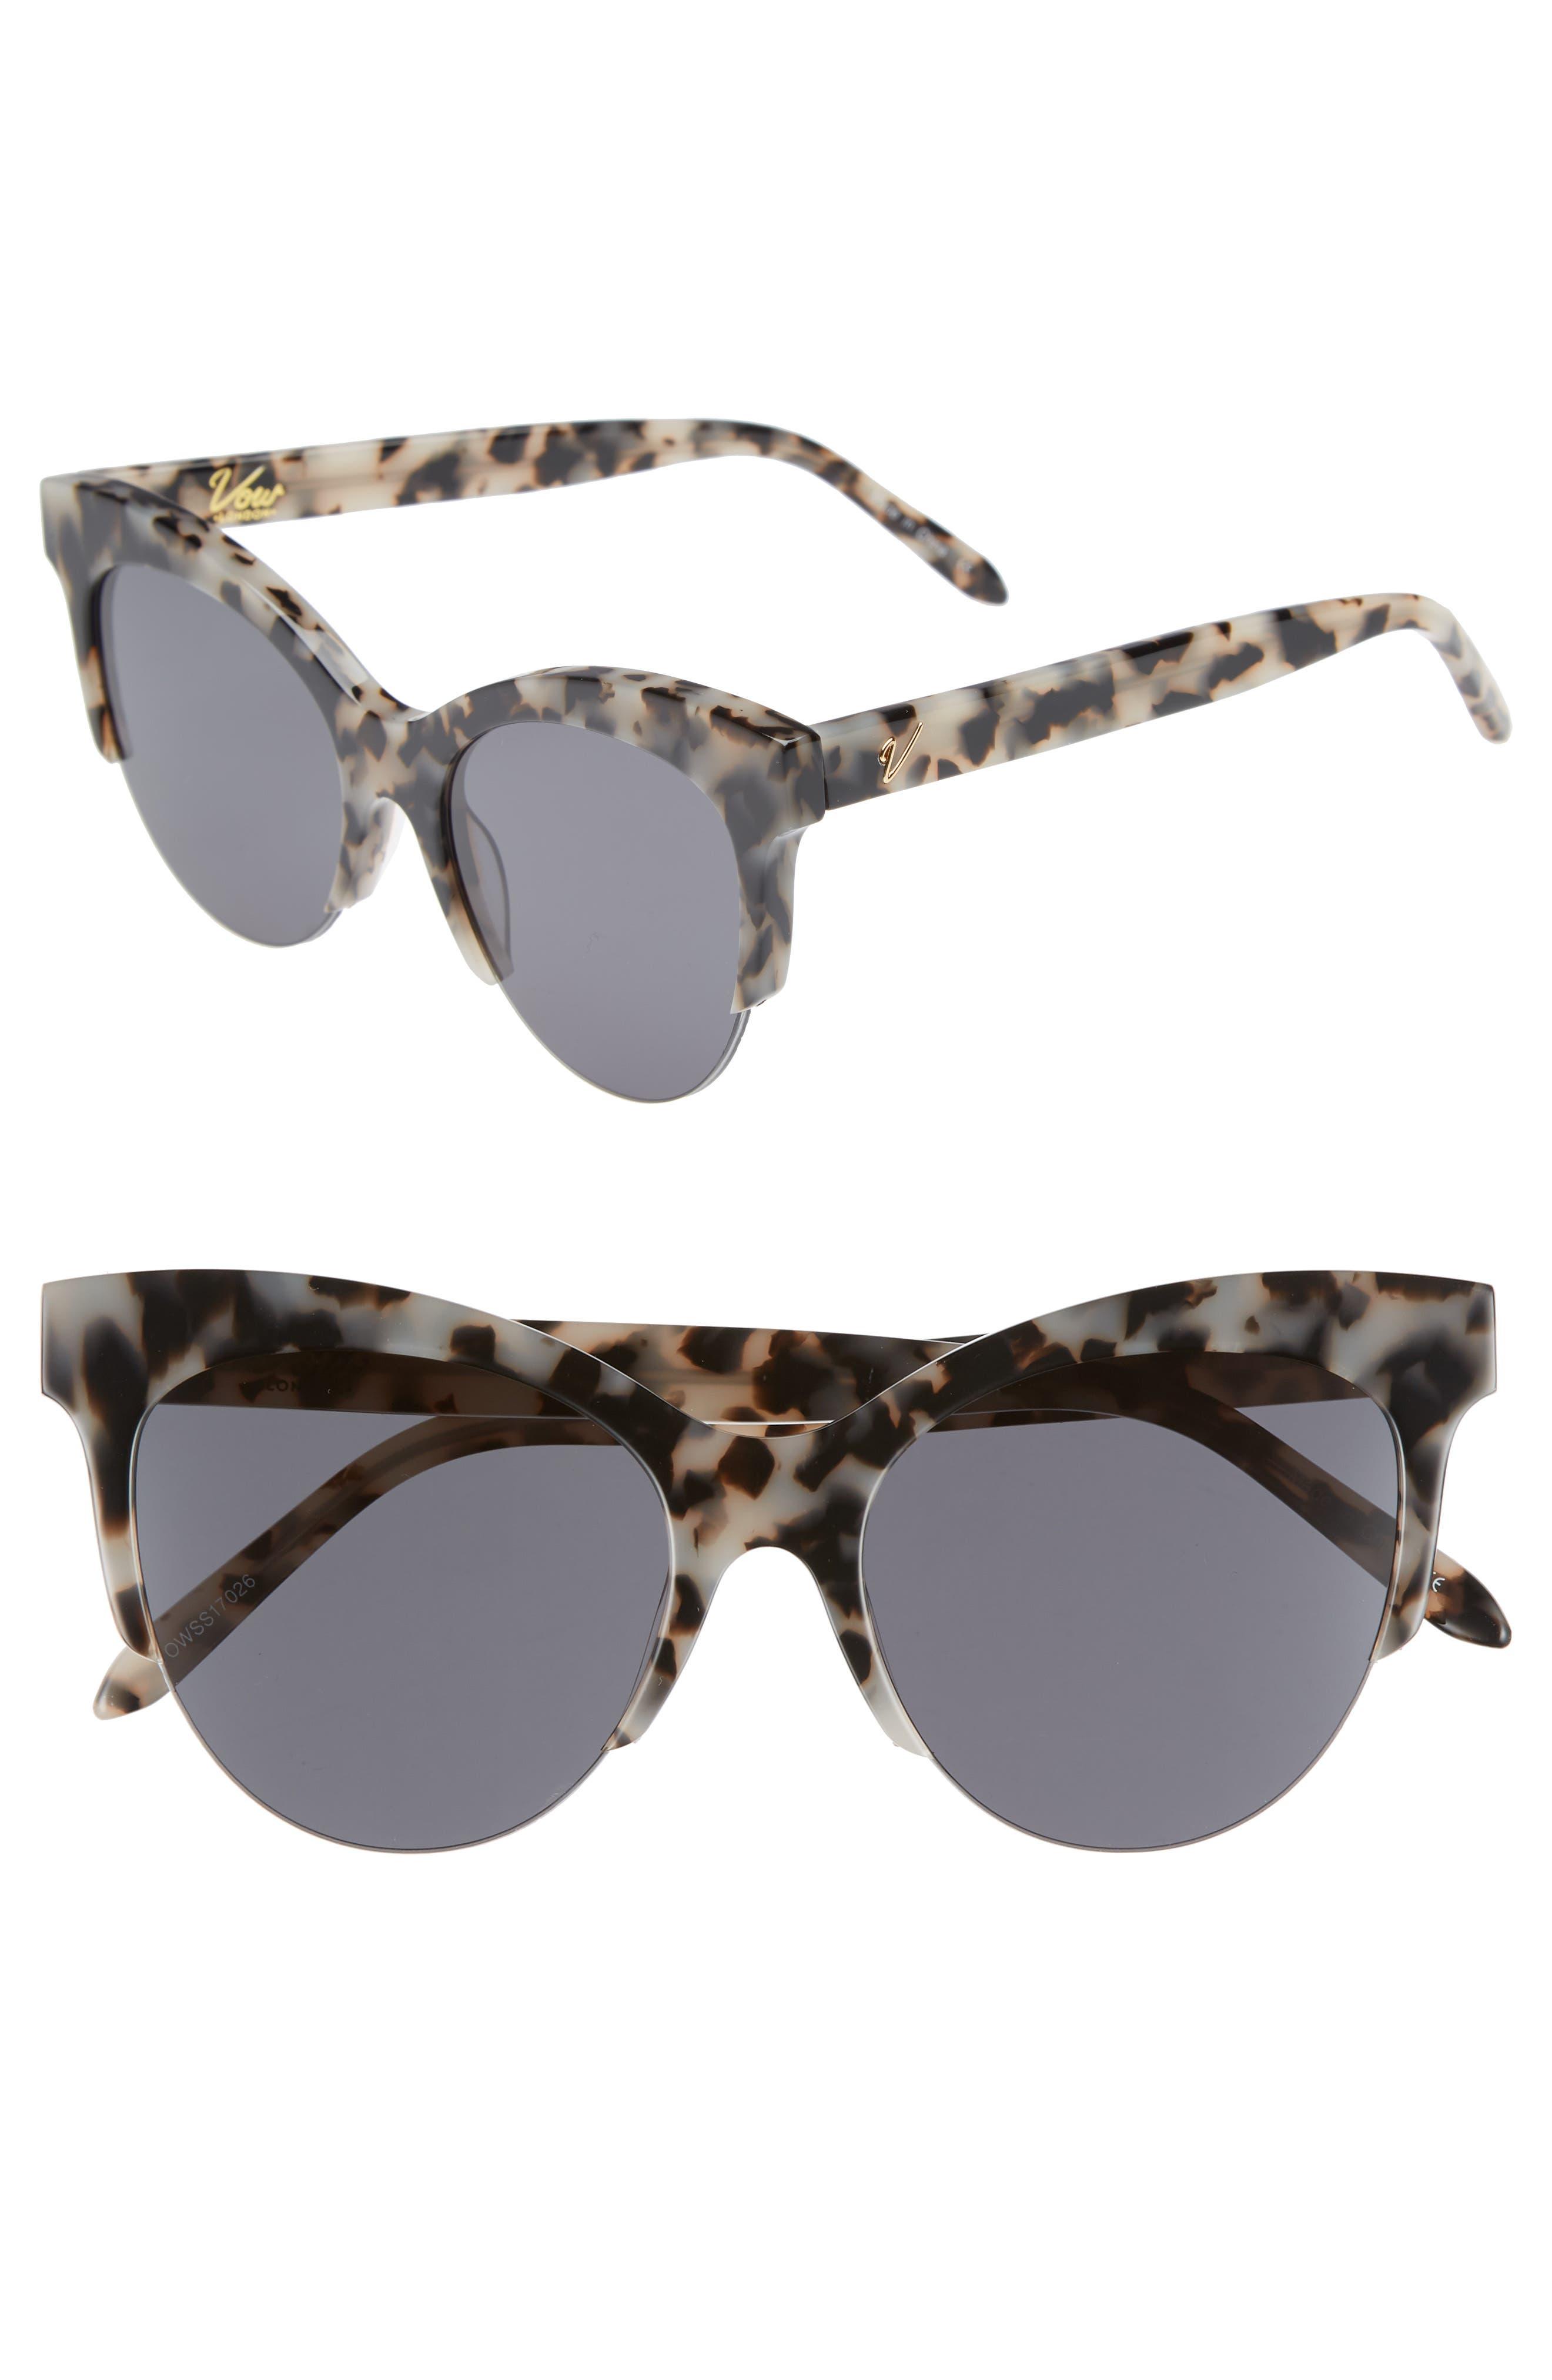 Cody 53mm Cat Eye Sunglasses,                         Main,                         color, Milky Tortoise/ Smoke